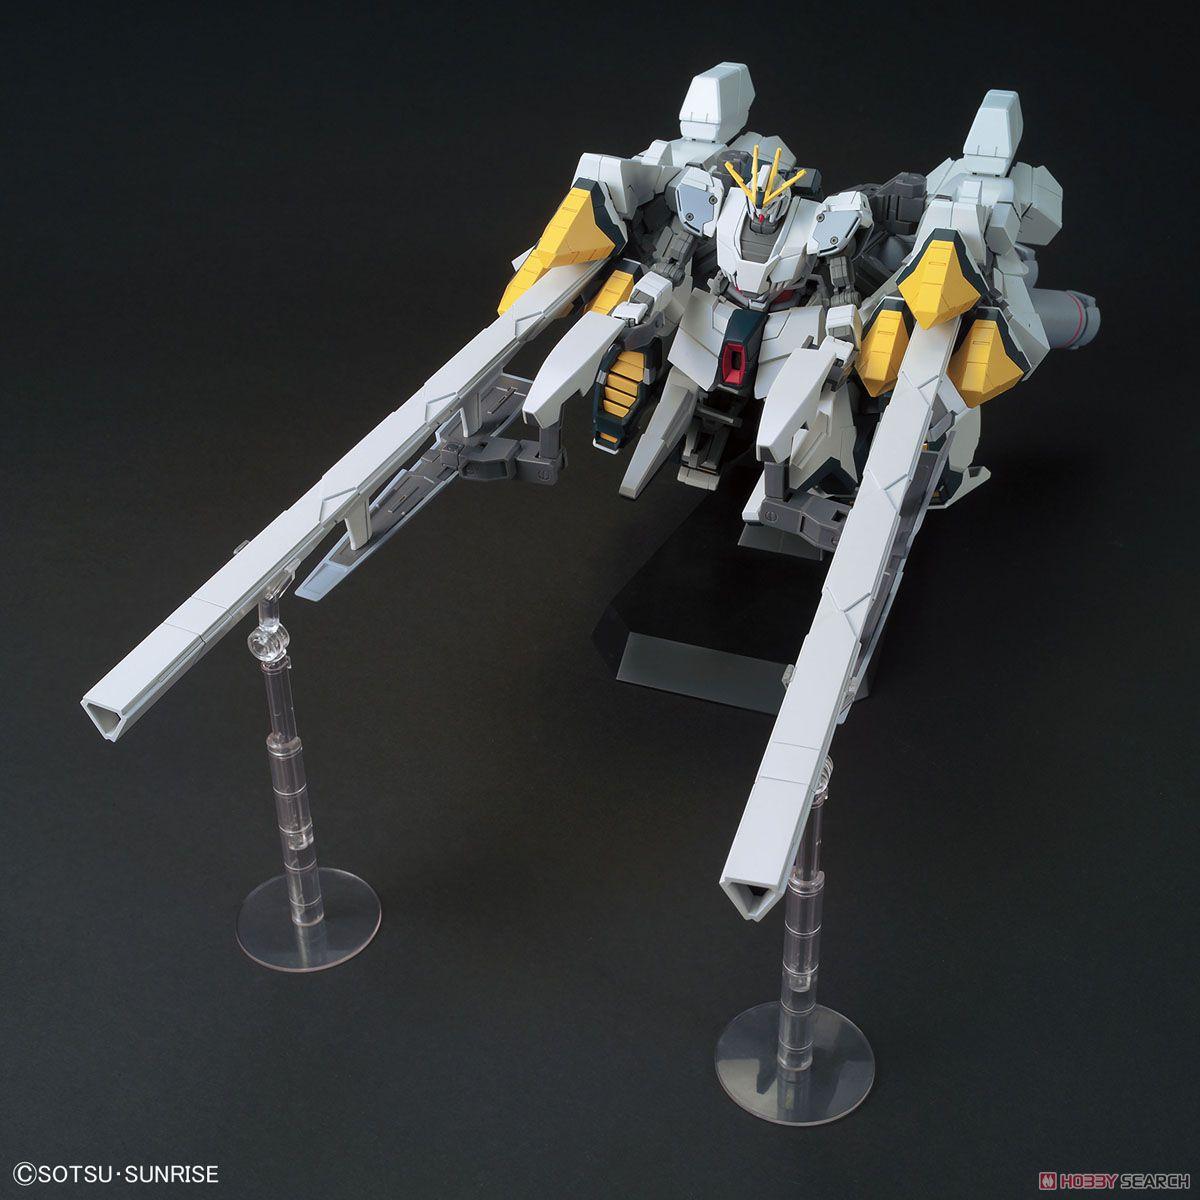 HGUC『ナラティブガンダム A装備』ガンダムNT 1/144 プラモデル-004